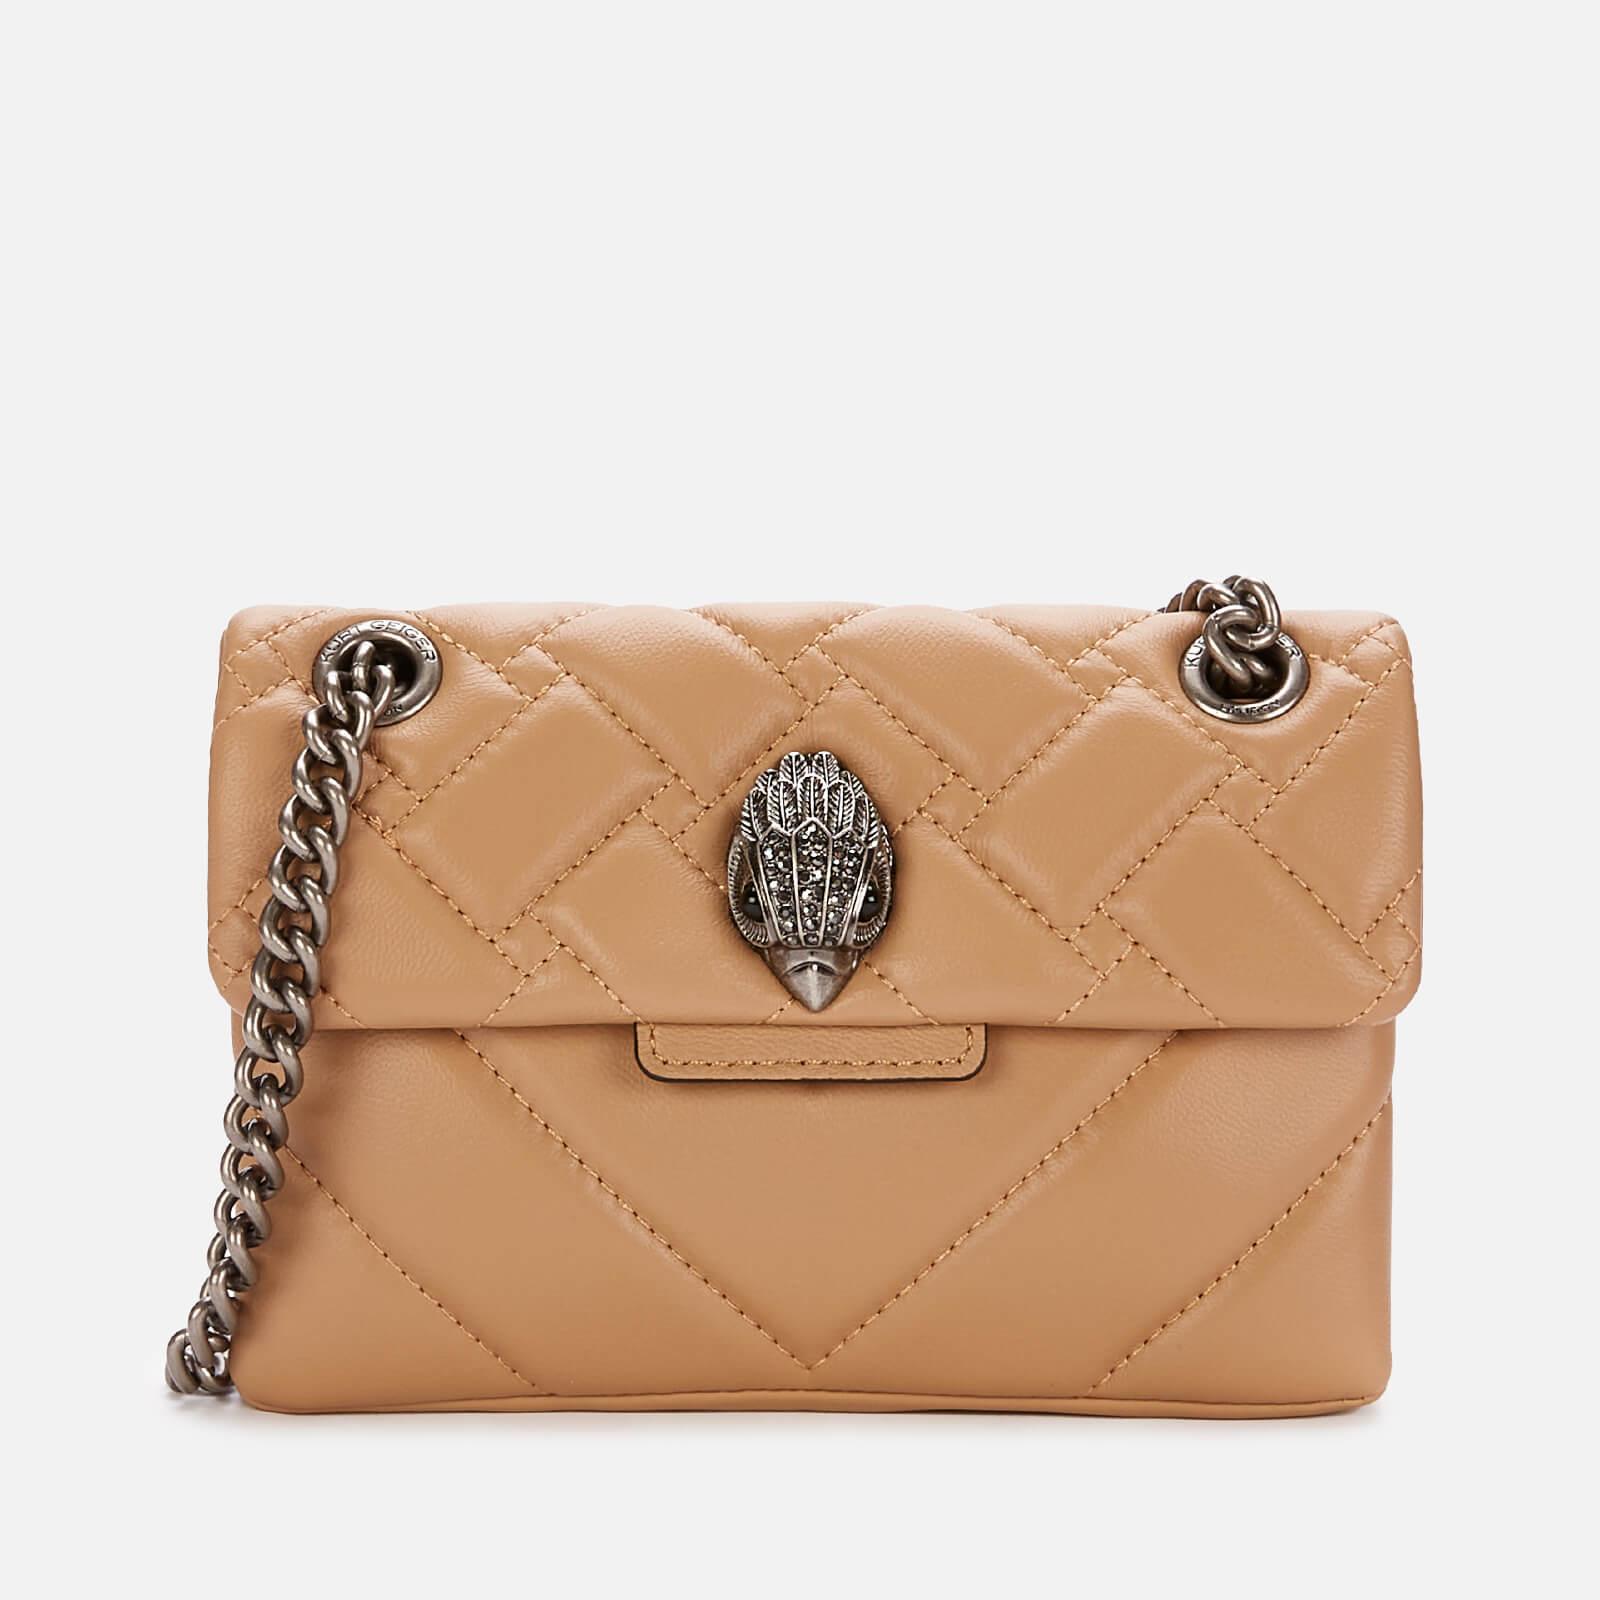 Kurt Geiger London Women's Mini Kensington X Bag - Camel